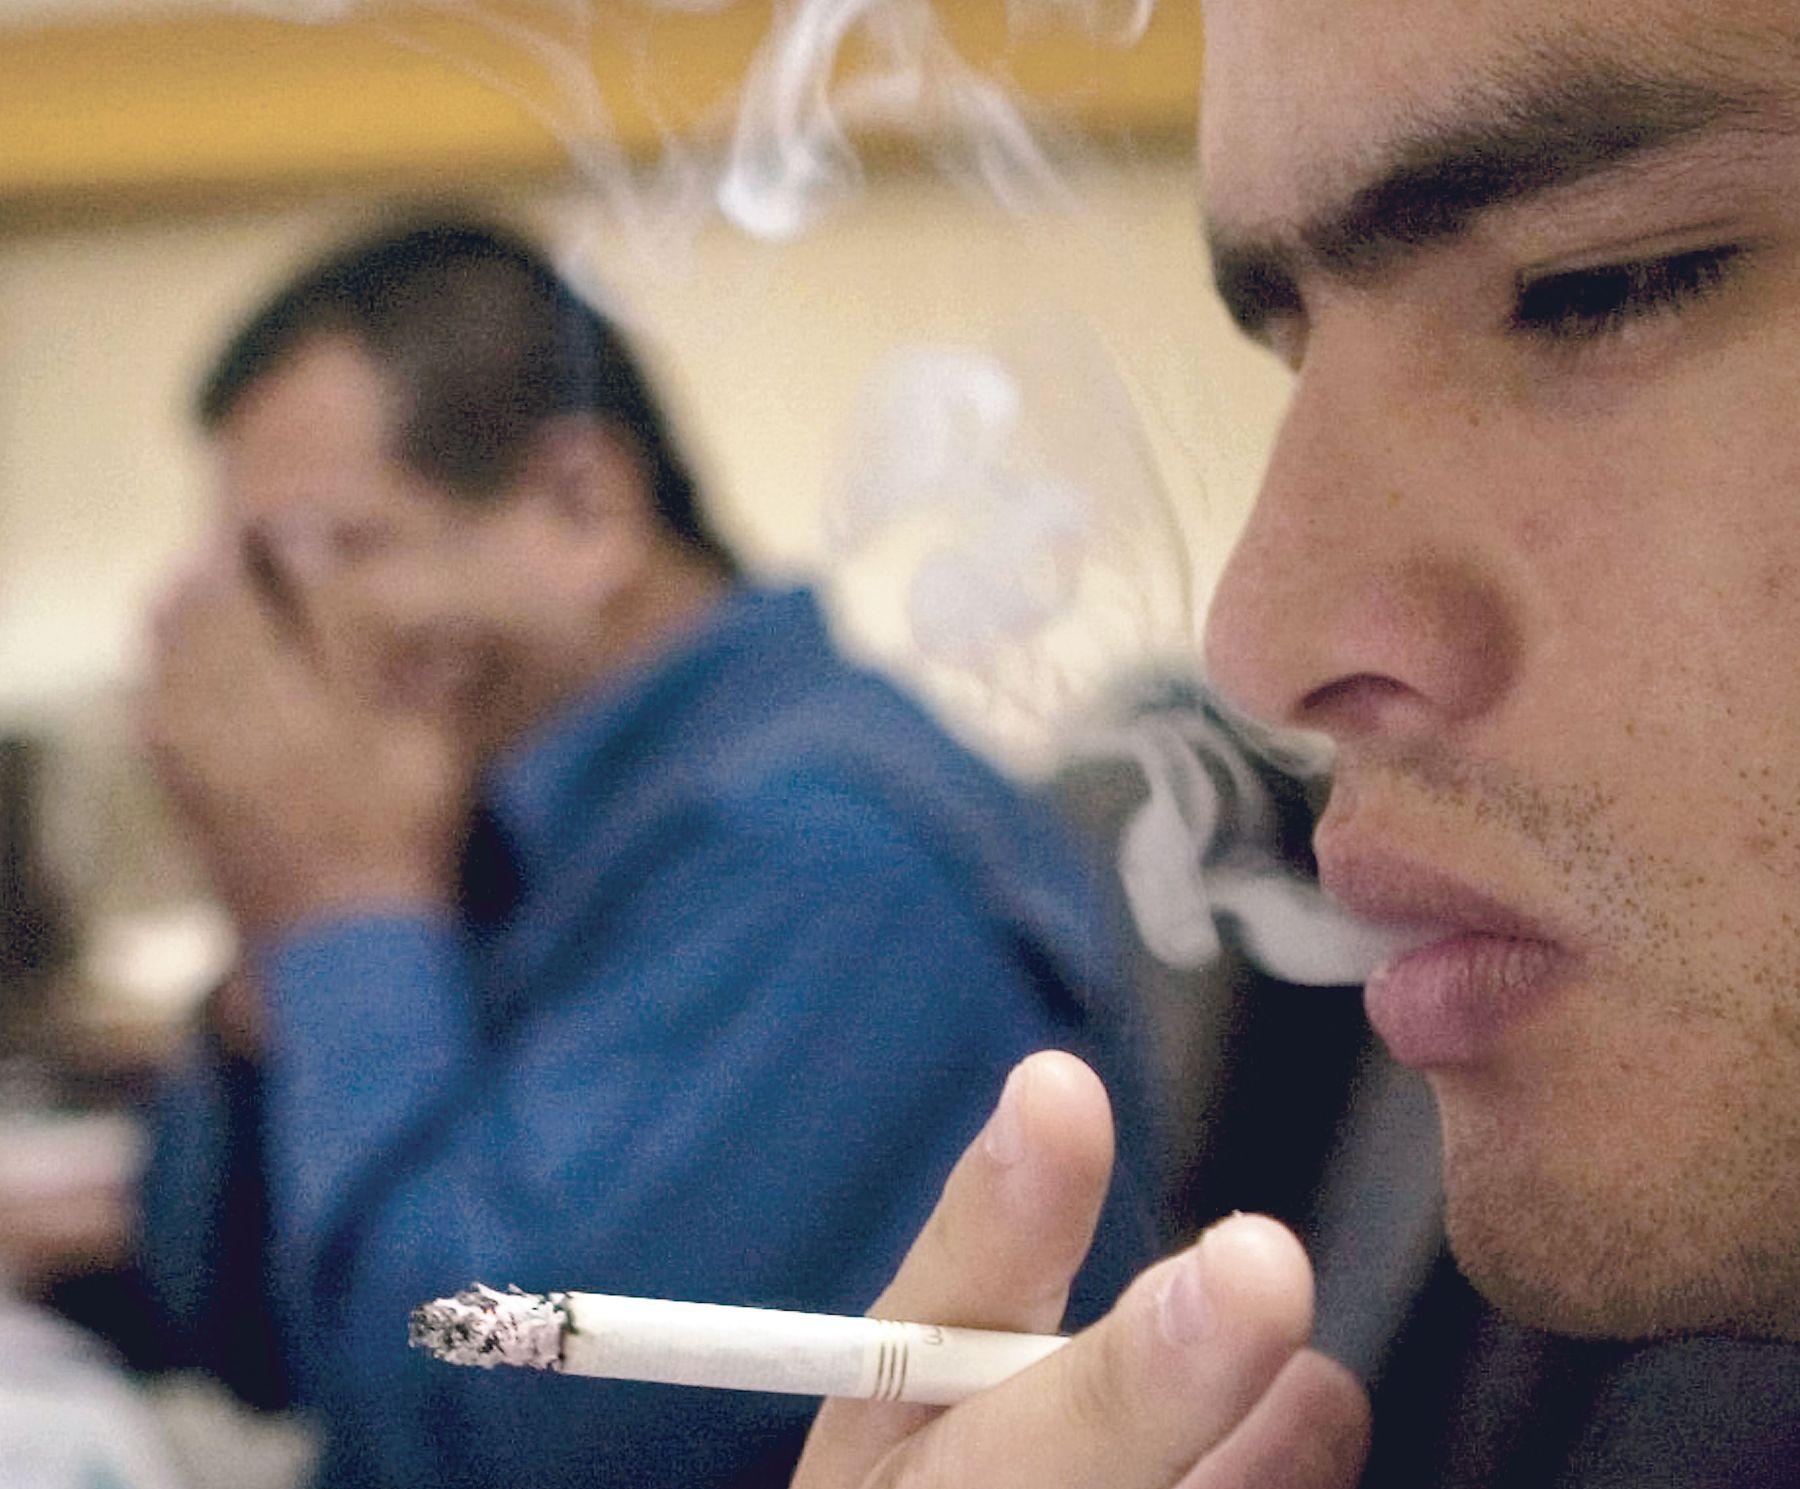 Tabaquismo, principal causa de cáncer de pulmón. Foto: ANDINA/archivo